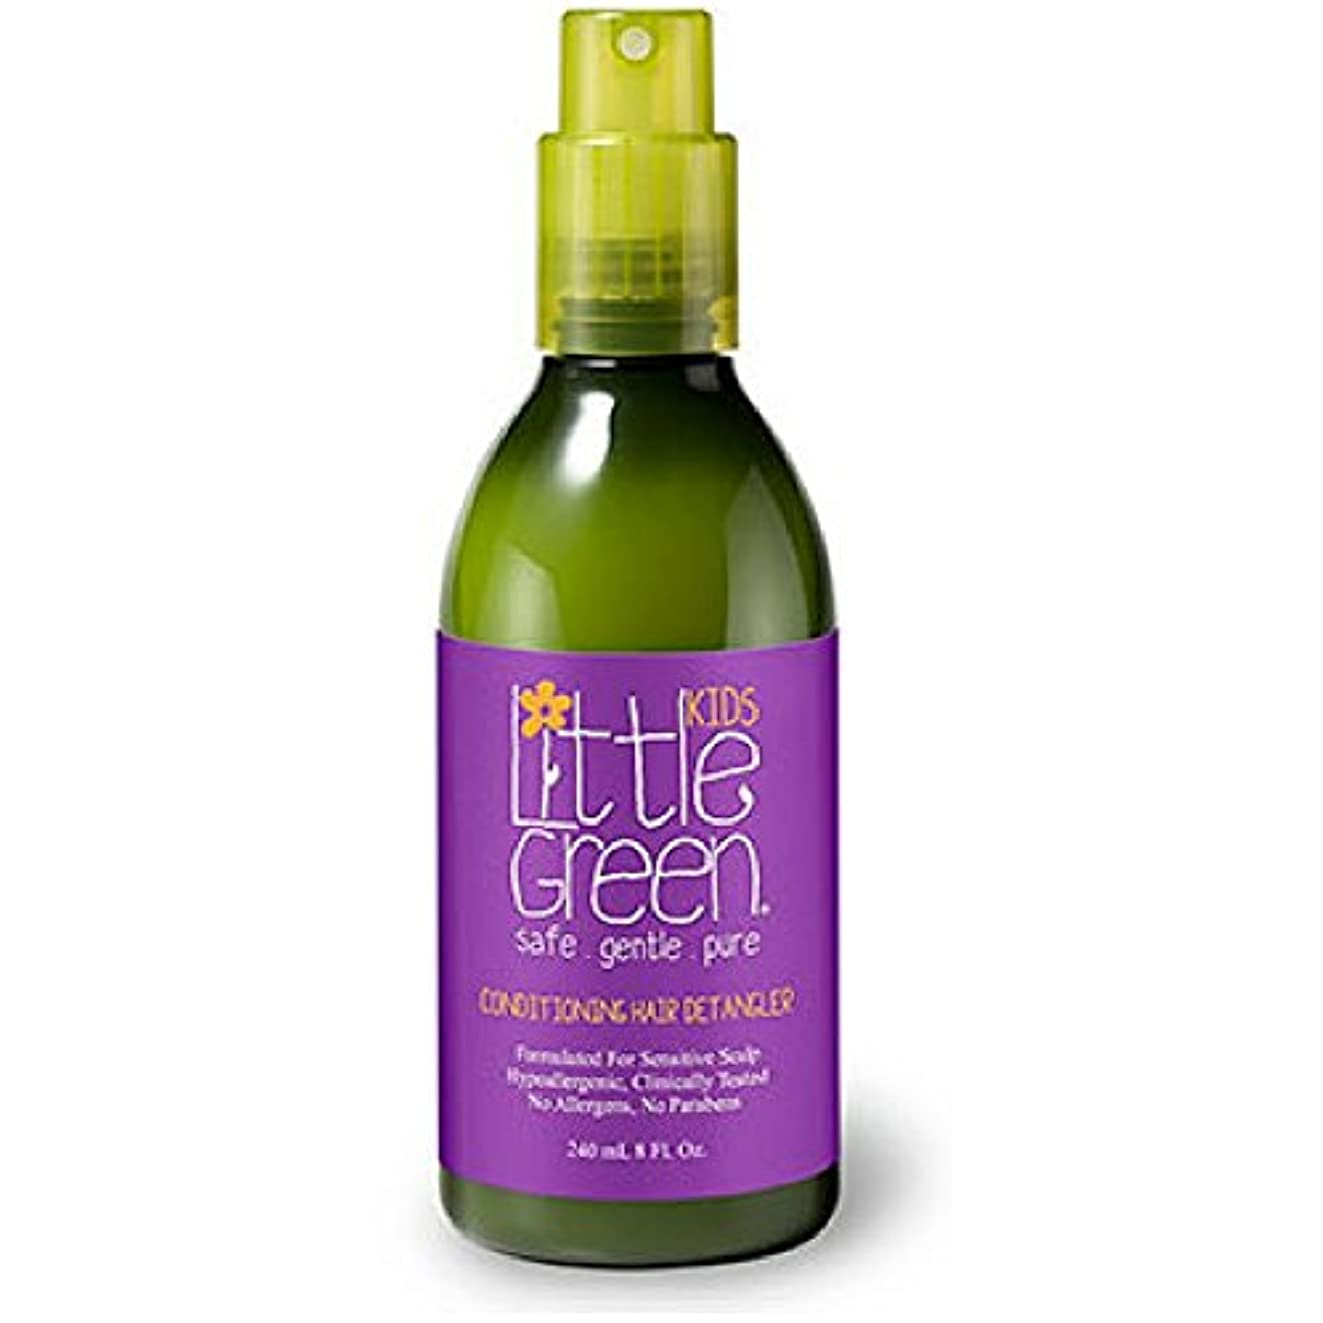 Little Green キッズコンディショニングDetangler - 子供Detanglerスプレー - 安全かつ非毒性 - 低刺激性 - - パラベンやグルテンフリー - ウェットまたはドライの髪に使用し臨床的に子供...